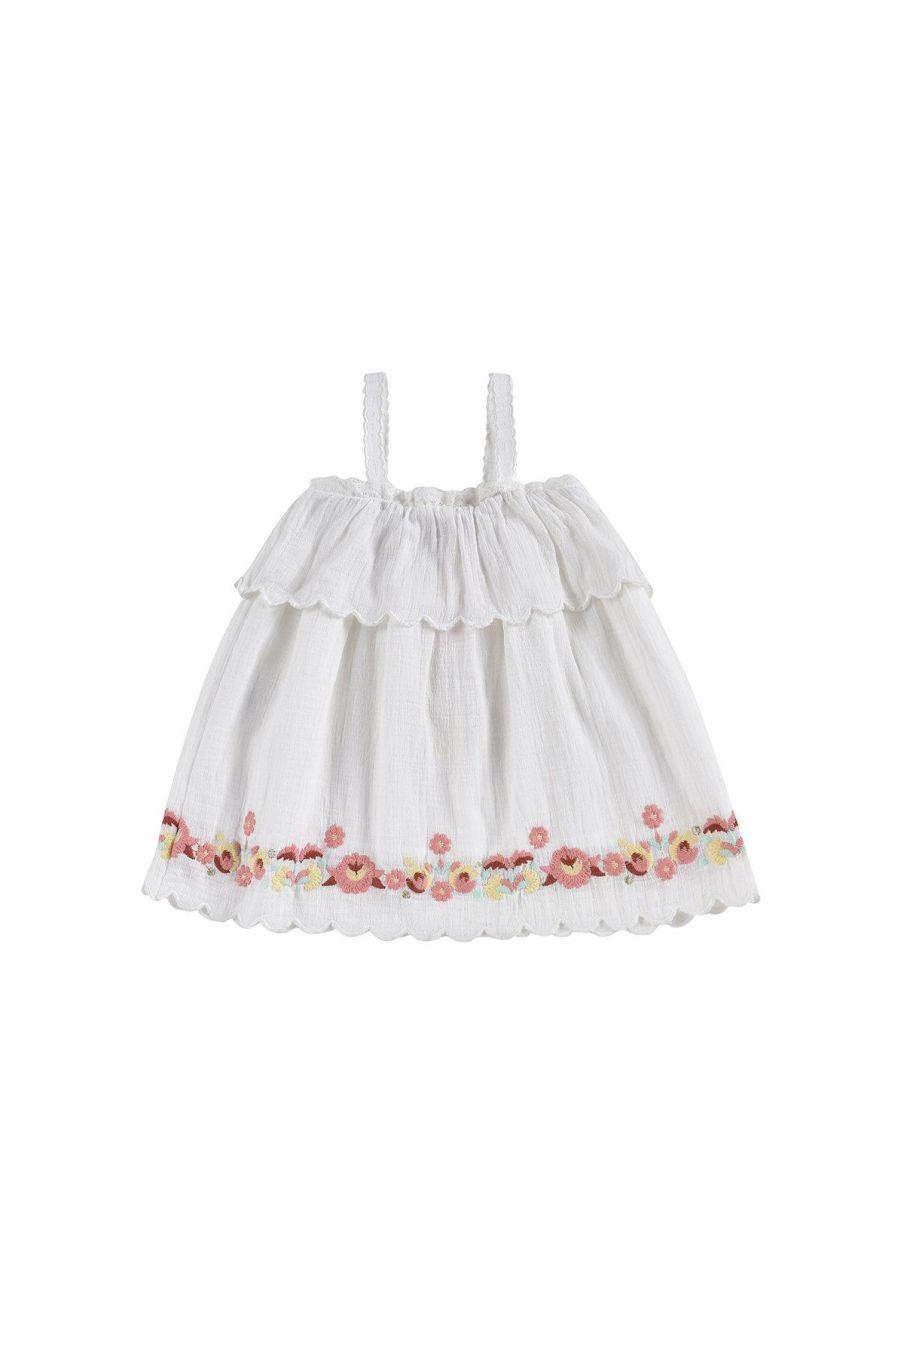 boheme chic vintage robe bébé fille solane ecru